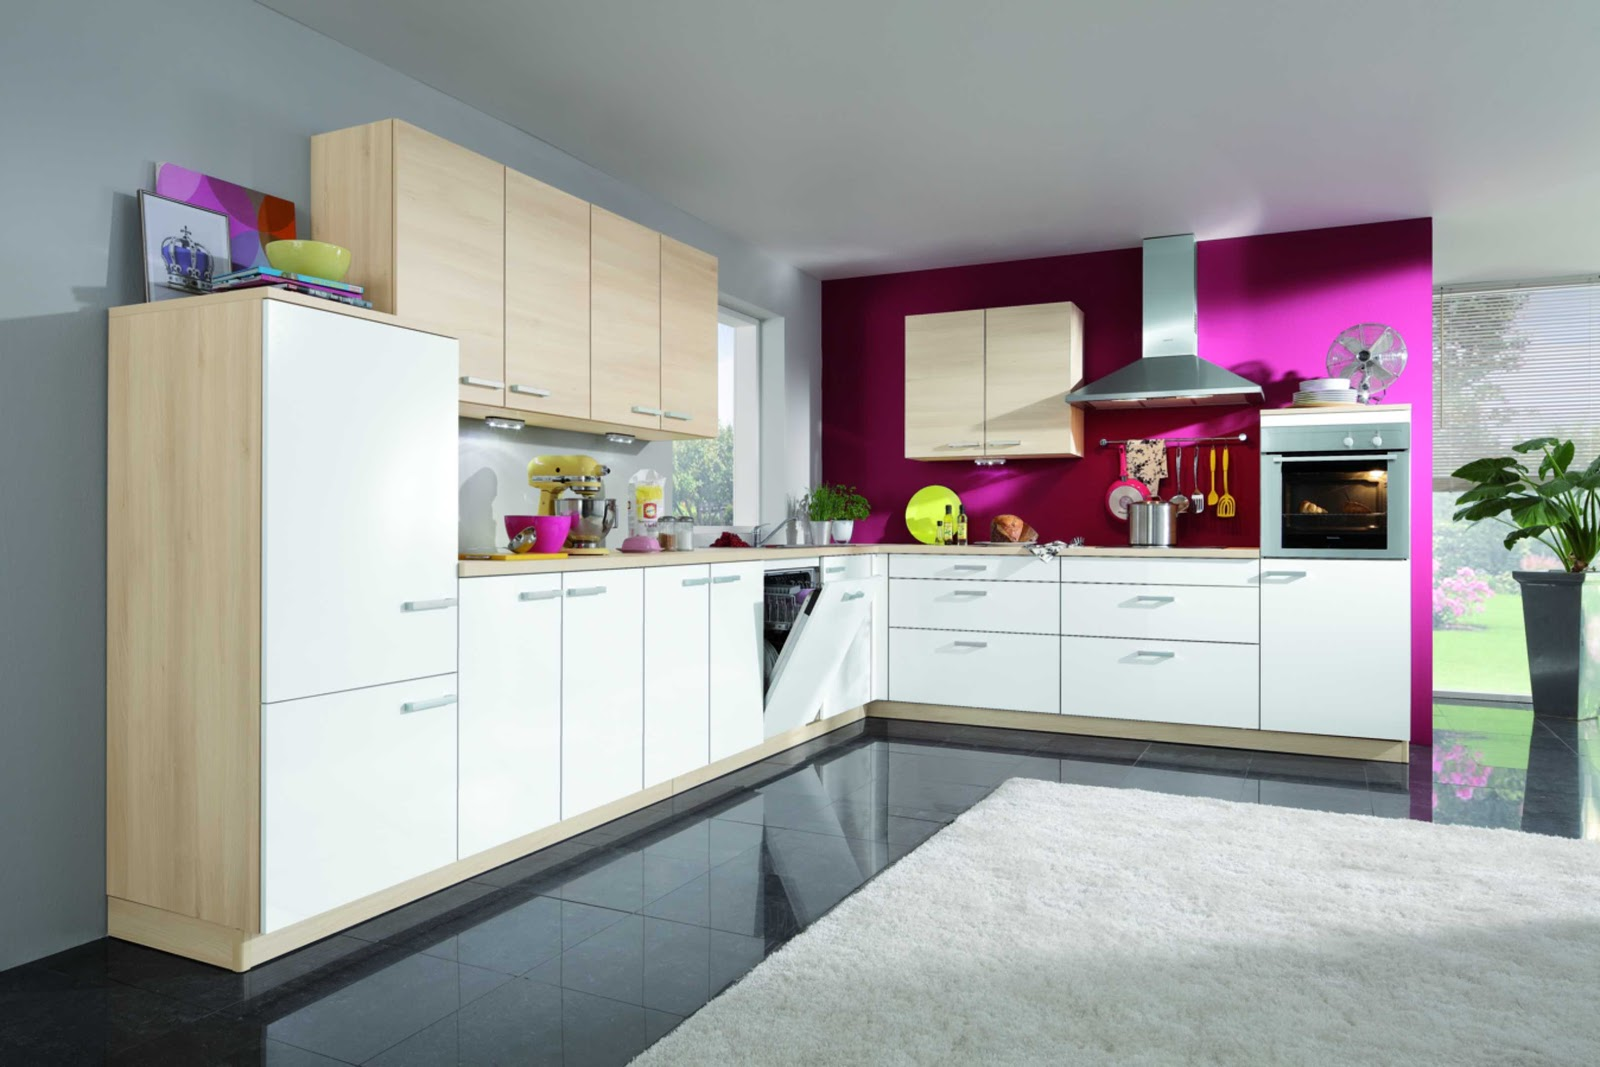 Gambar Desain Interior Minimalis: Gambar Dapur Minimalis ...